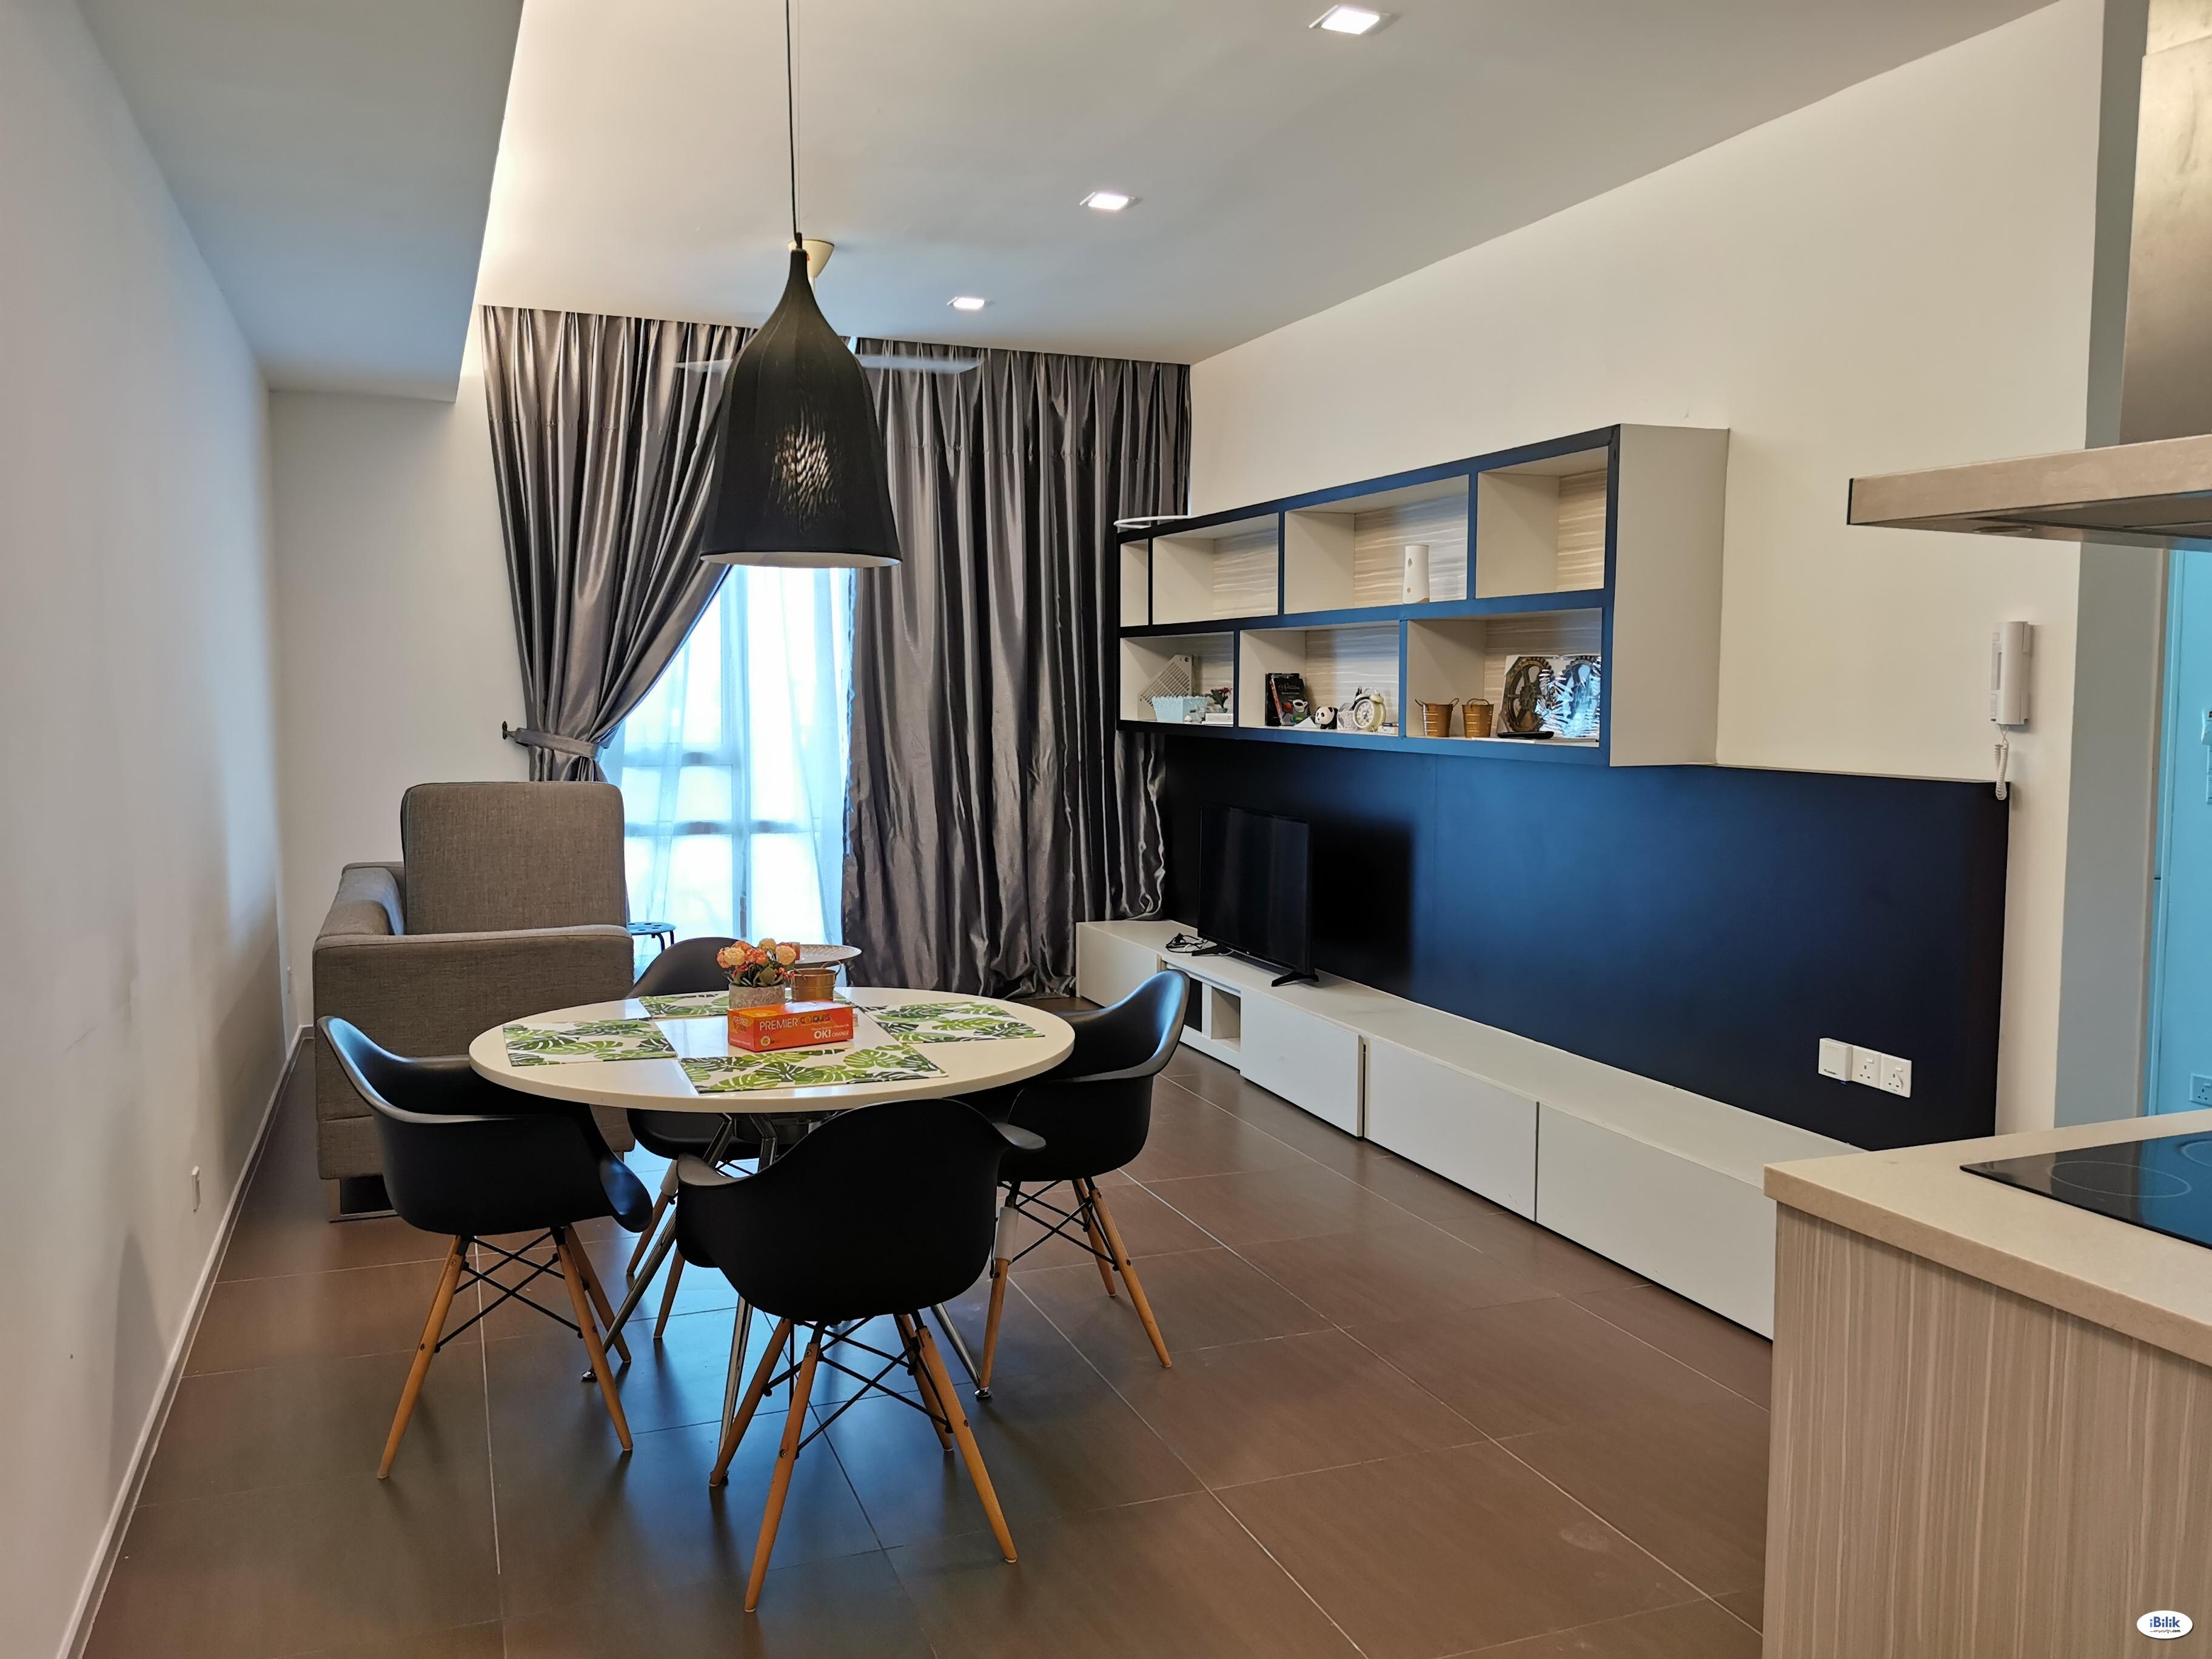 Middle Room at Garden Plaza, Cyberjaya